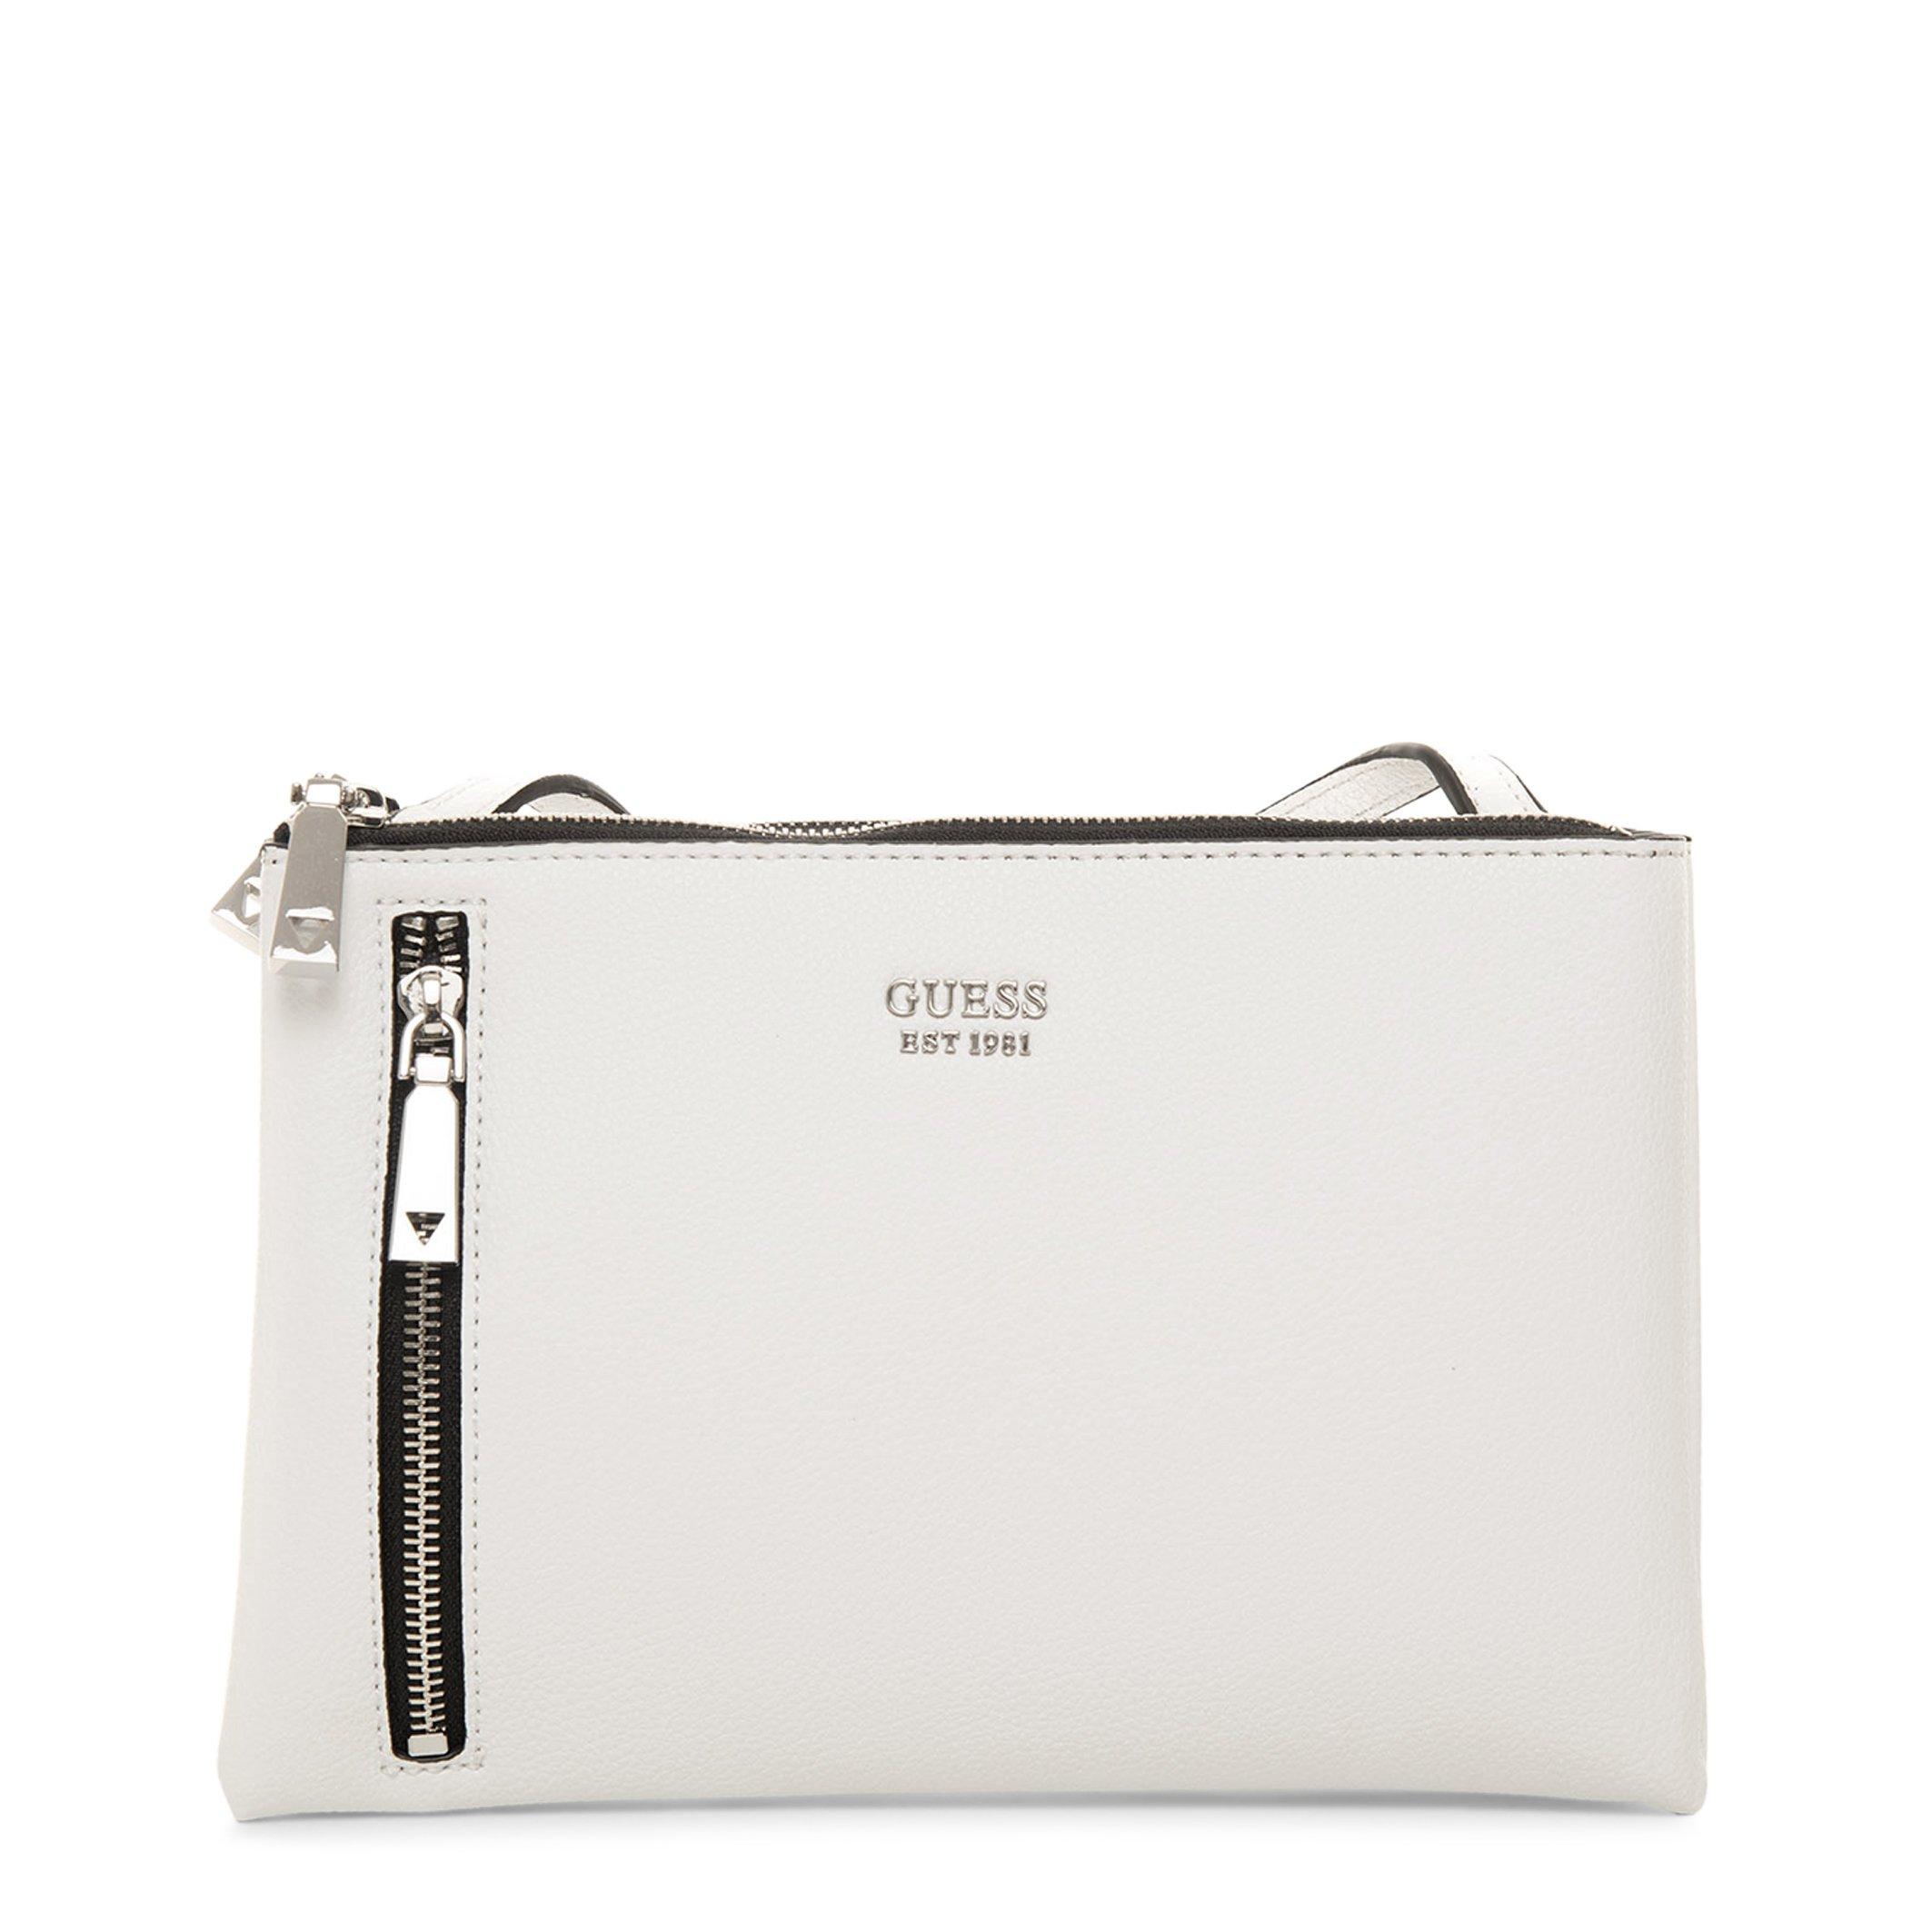 Guess Women's Crossbody Bag Various Colours Naya_HWVY78_81700 - white NOSIZE